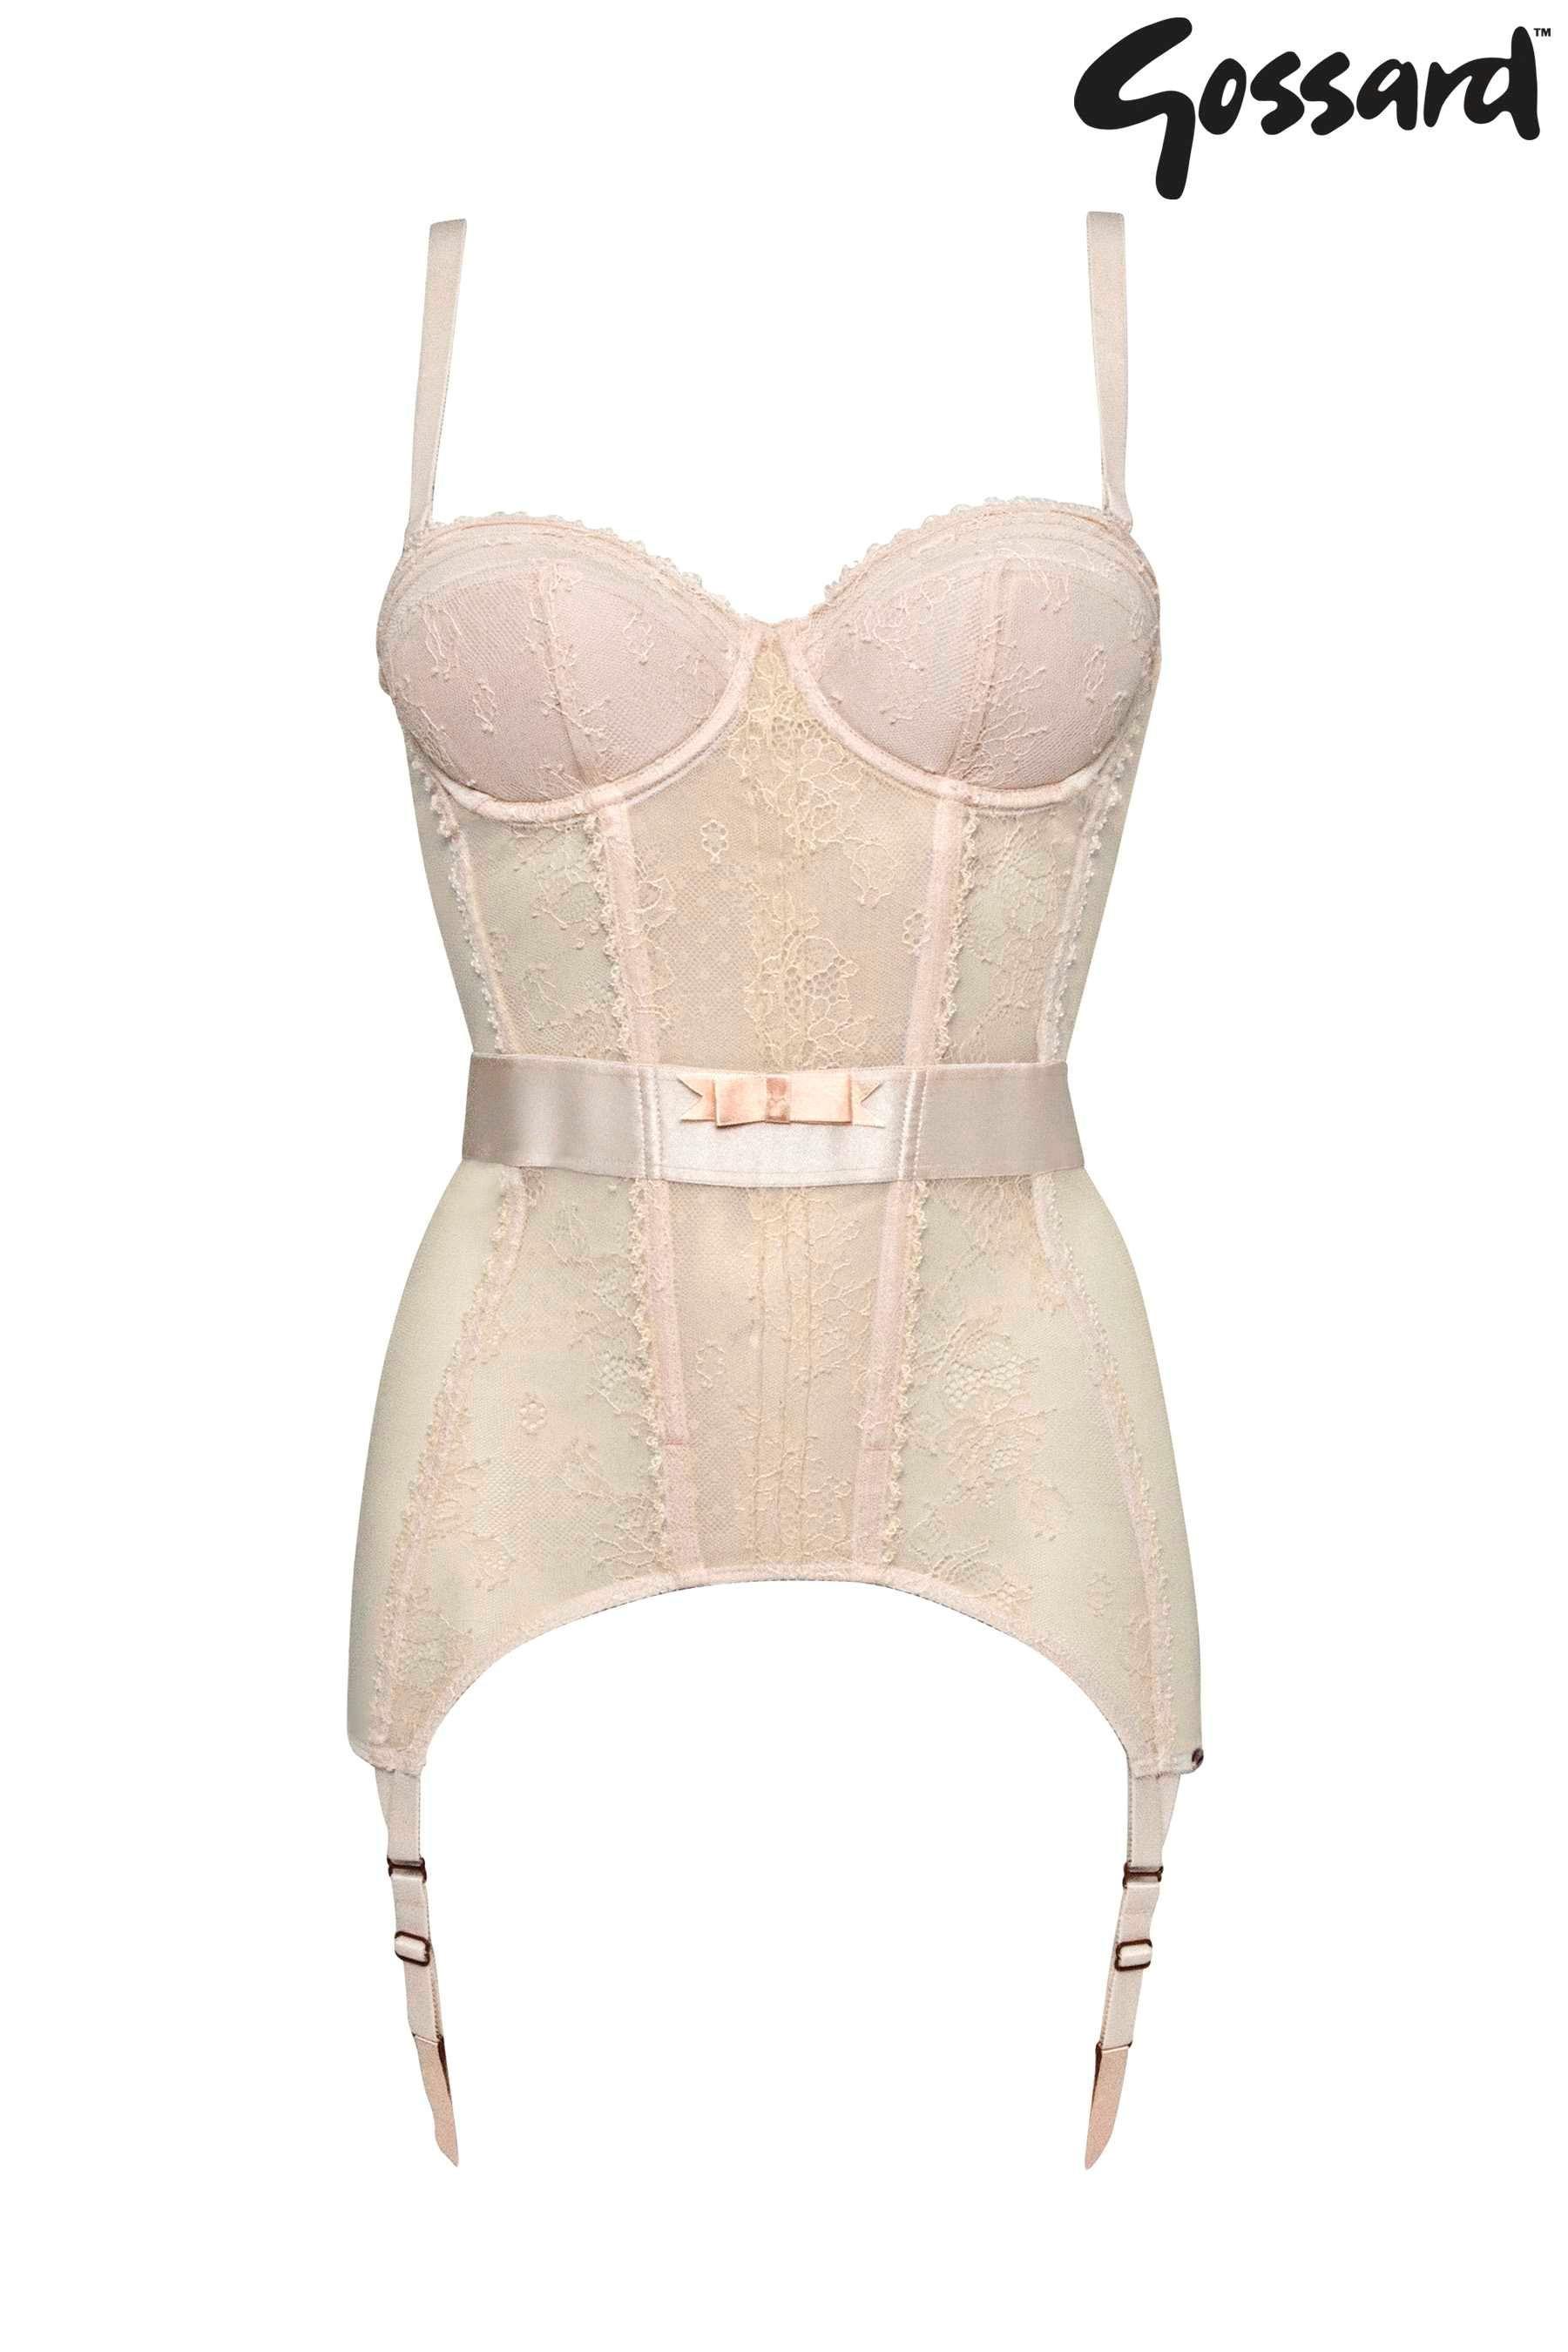 Buy Gossard™ Ivory Corselette Bra from the Next UK online shop ...